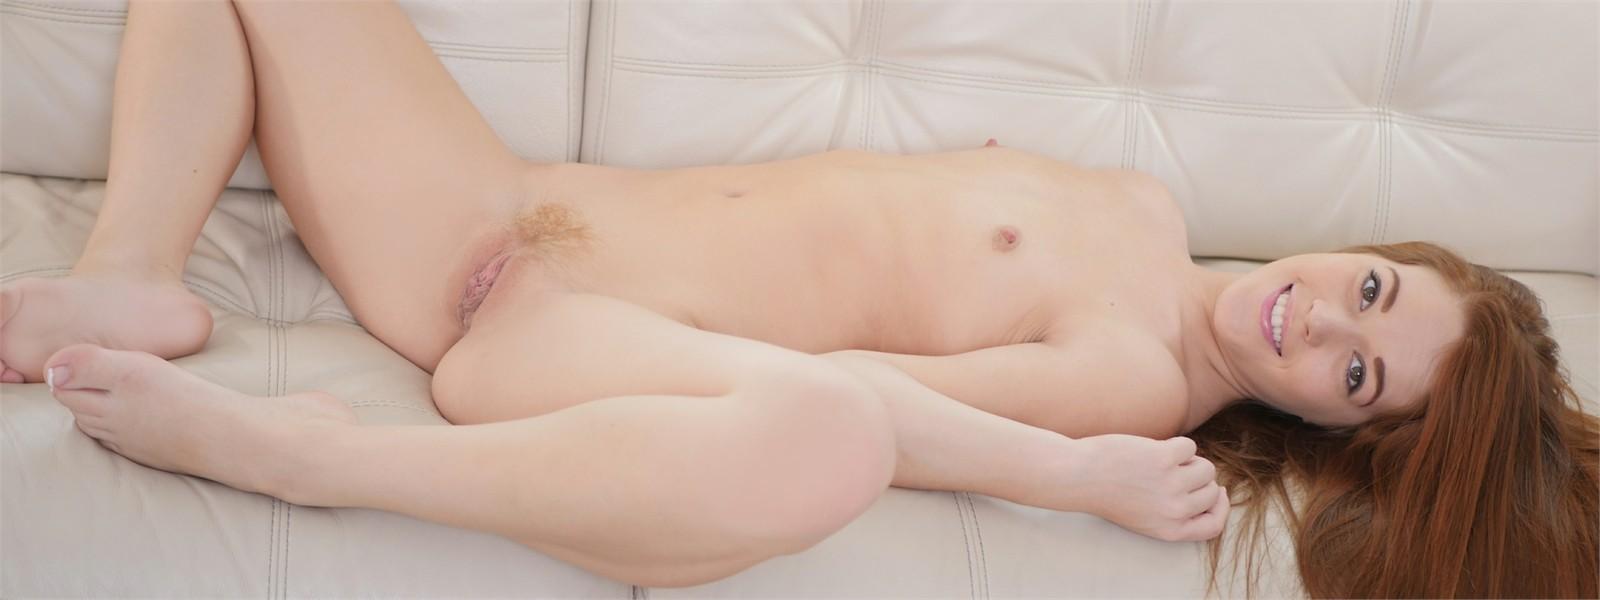 Kimberly Brix Pornstar